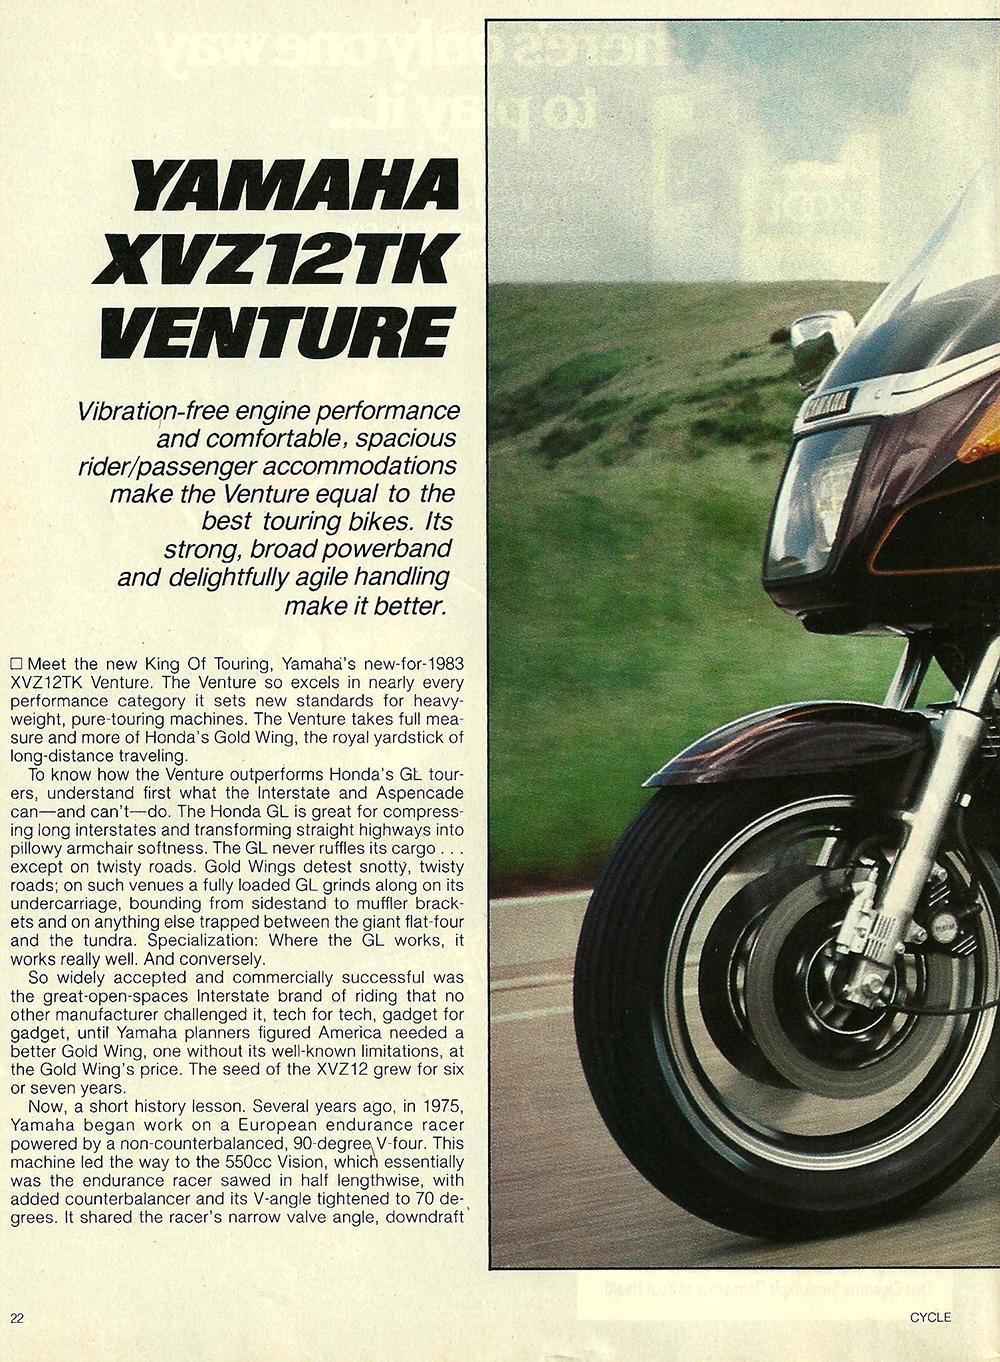 1983 Yamaha XVZ12TK Venture road test 01.jpg